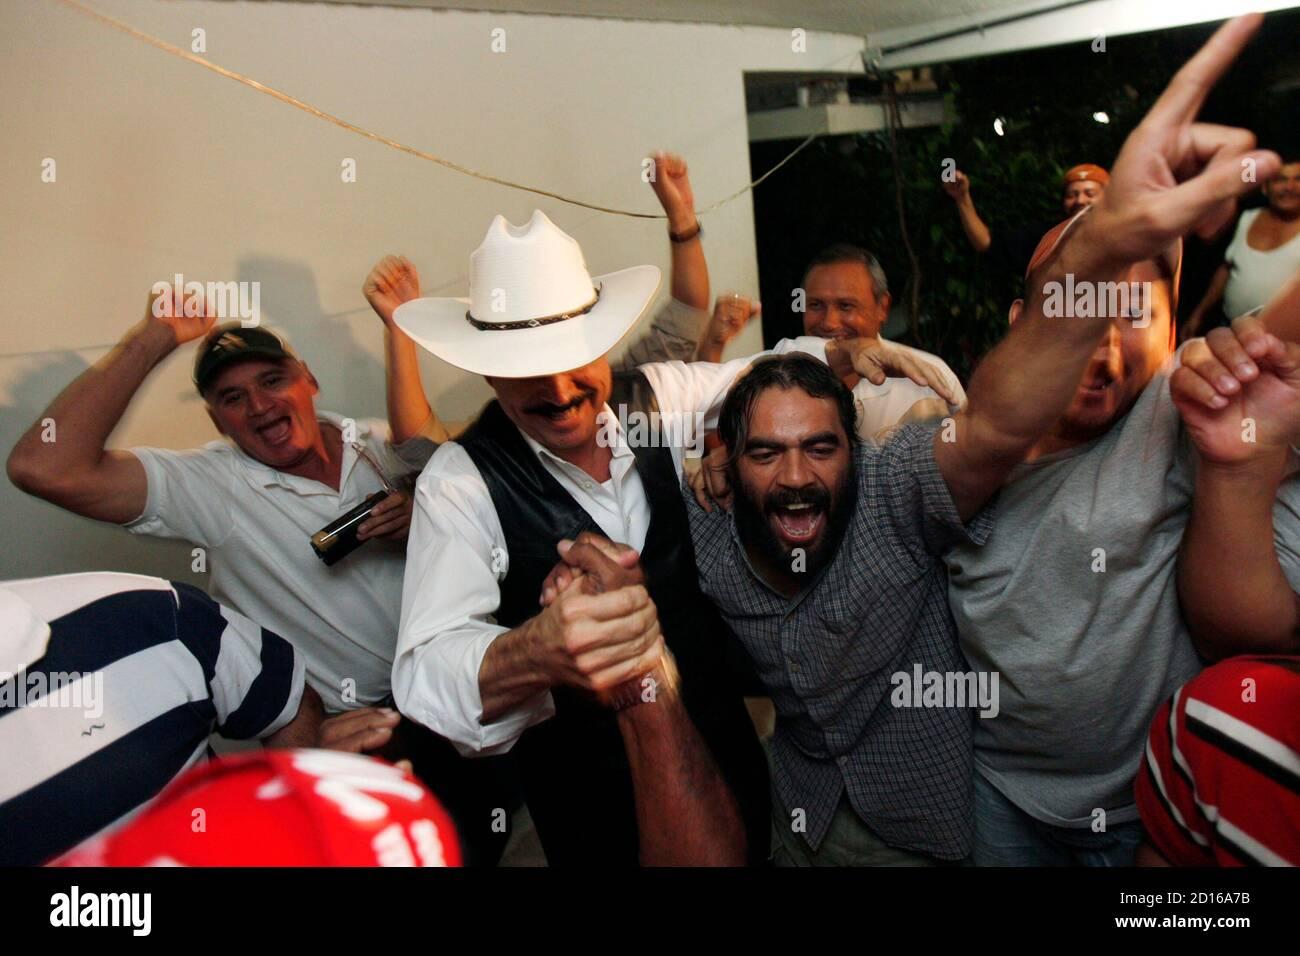 Ousted Honduras' President Manuel Zelaya (C) celebrates with supporters after Honduras' 2010 World Cup qualifying match victory over El Salvador, inside the Brazilian embassy in Tegucigalpa October 14, 2009. REUTERS/Edgard Garrido (HONDURAS POLITICS SPORT) Foto de stock